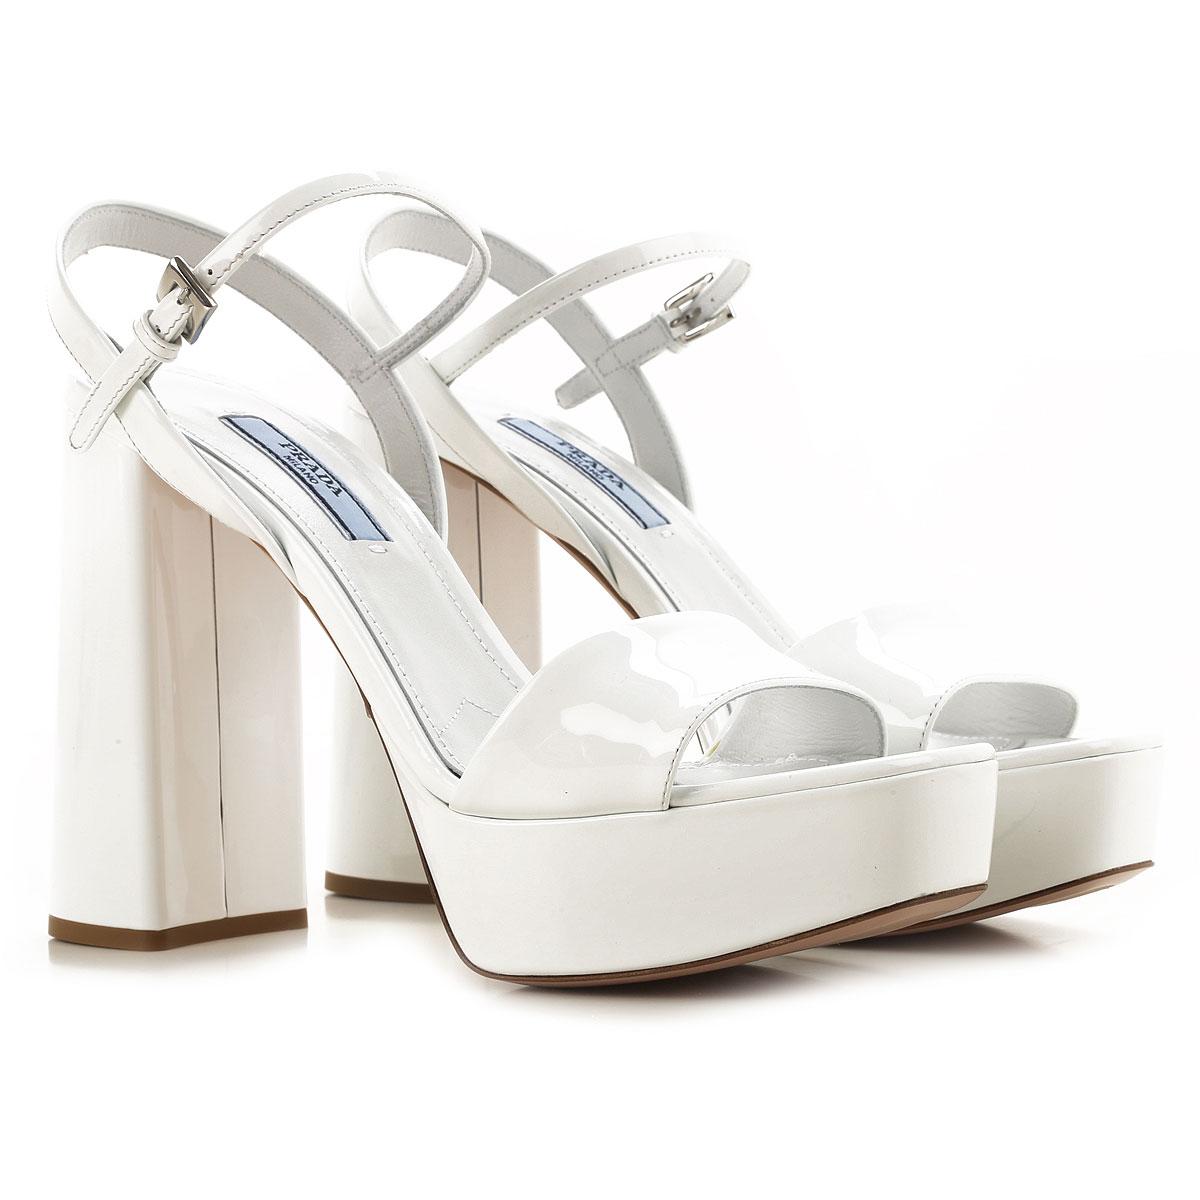 Prada Sandale Femme Pas cher en Soldes Outlet, Blanc, Cuir Verni, 2019, 36 38